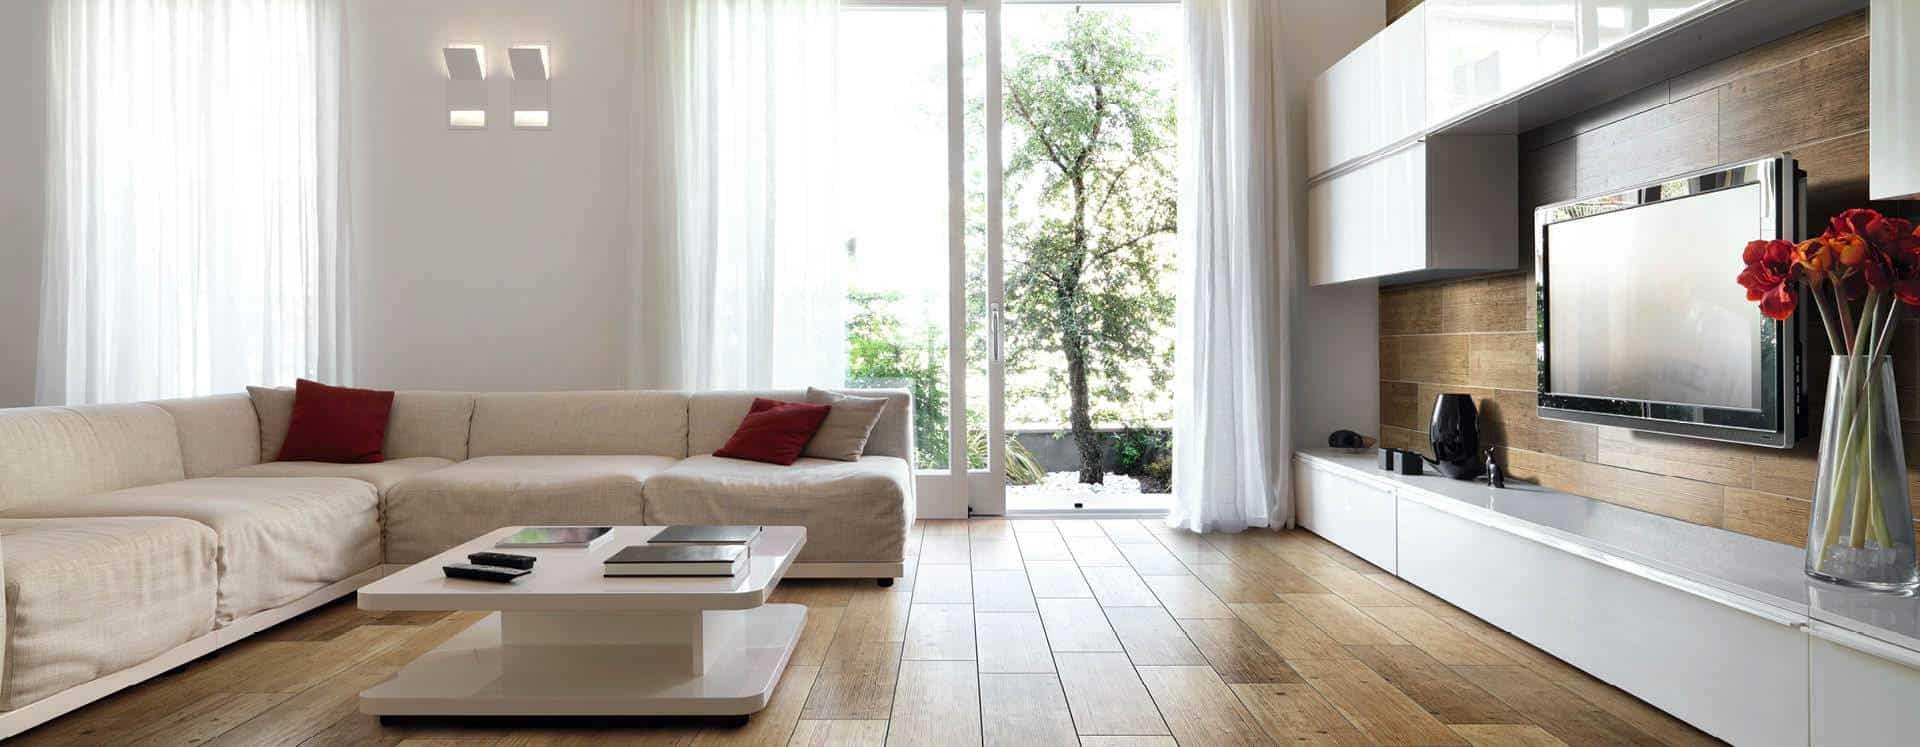 Right price tiles ireland tiles laminate flooring bathware wood effect tiles dailygadgetfo Choice Image